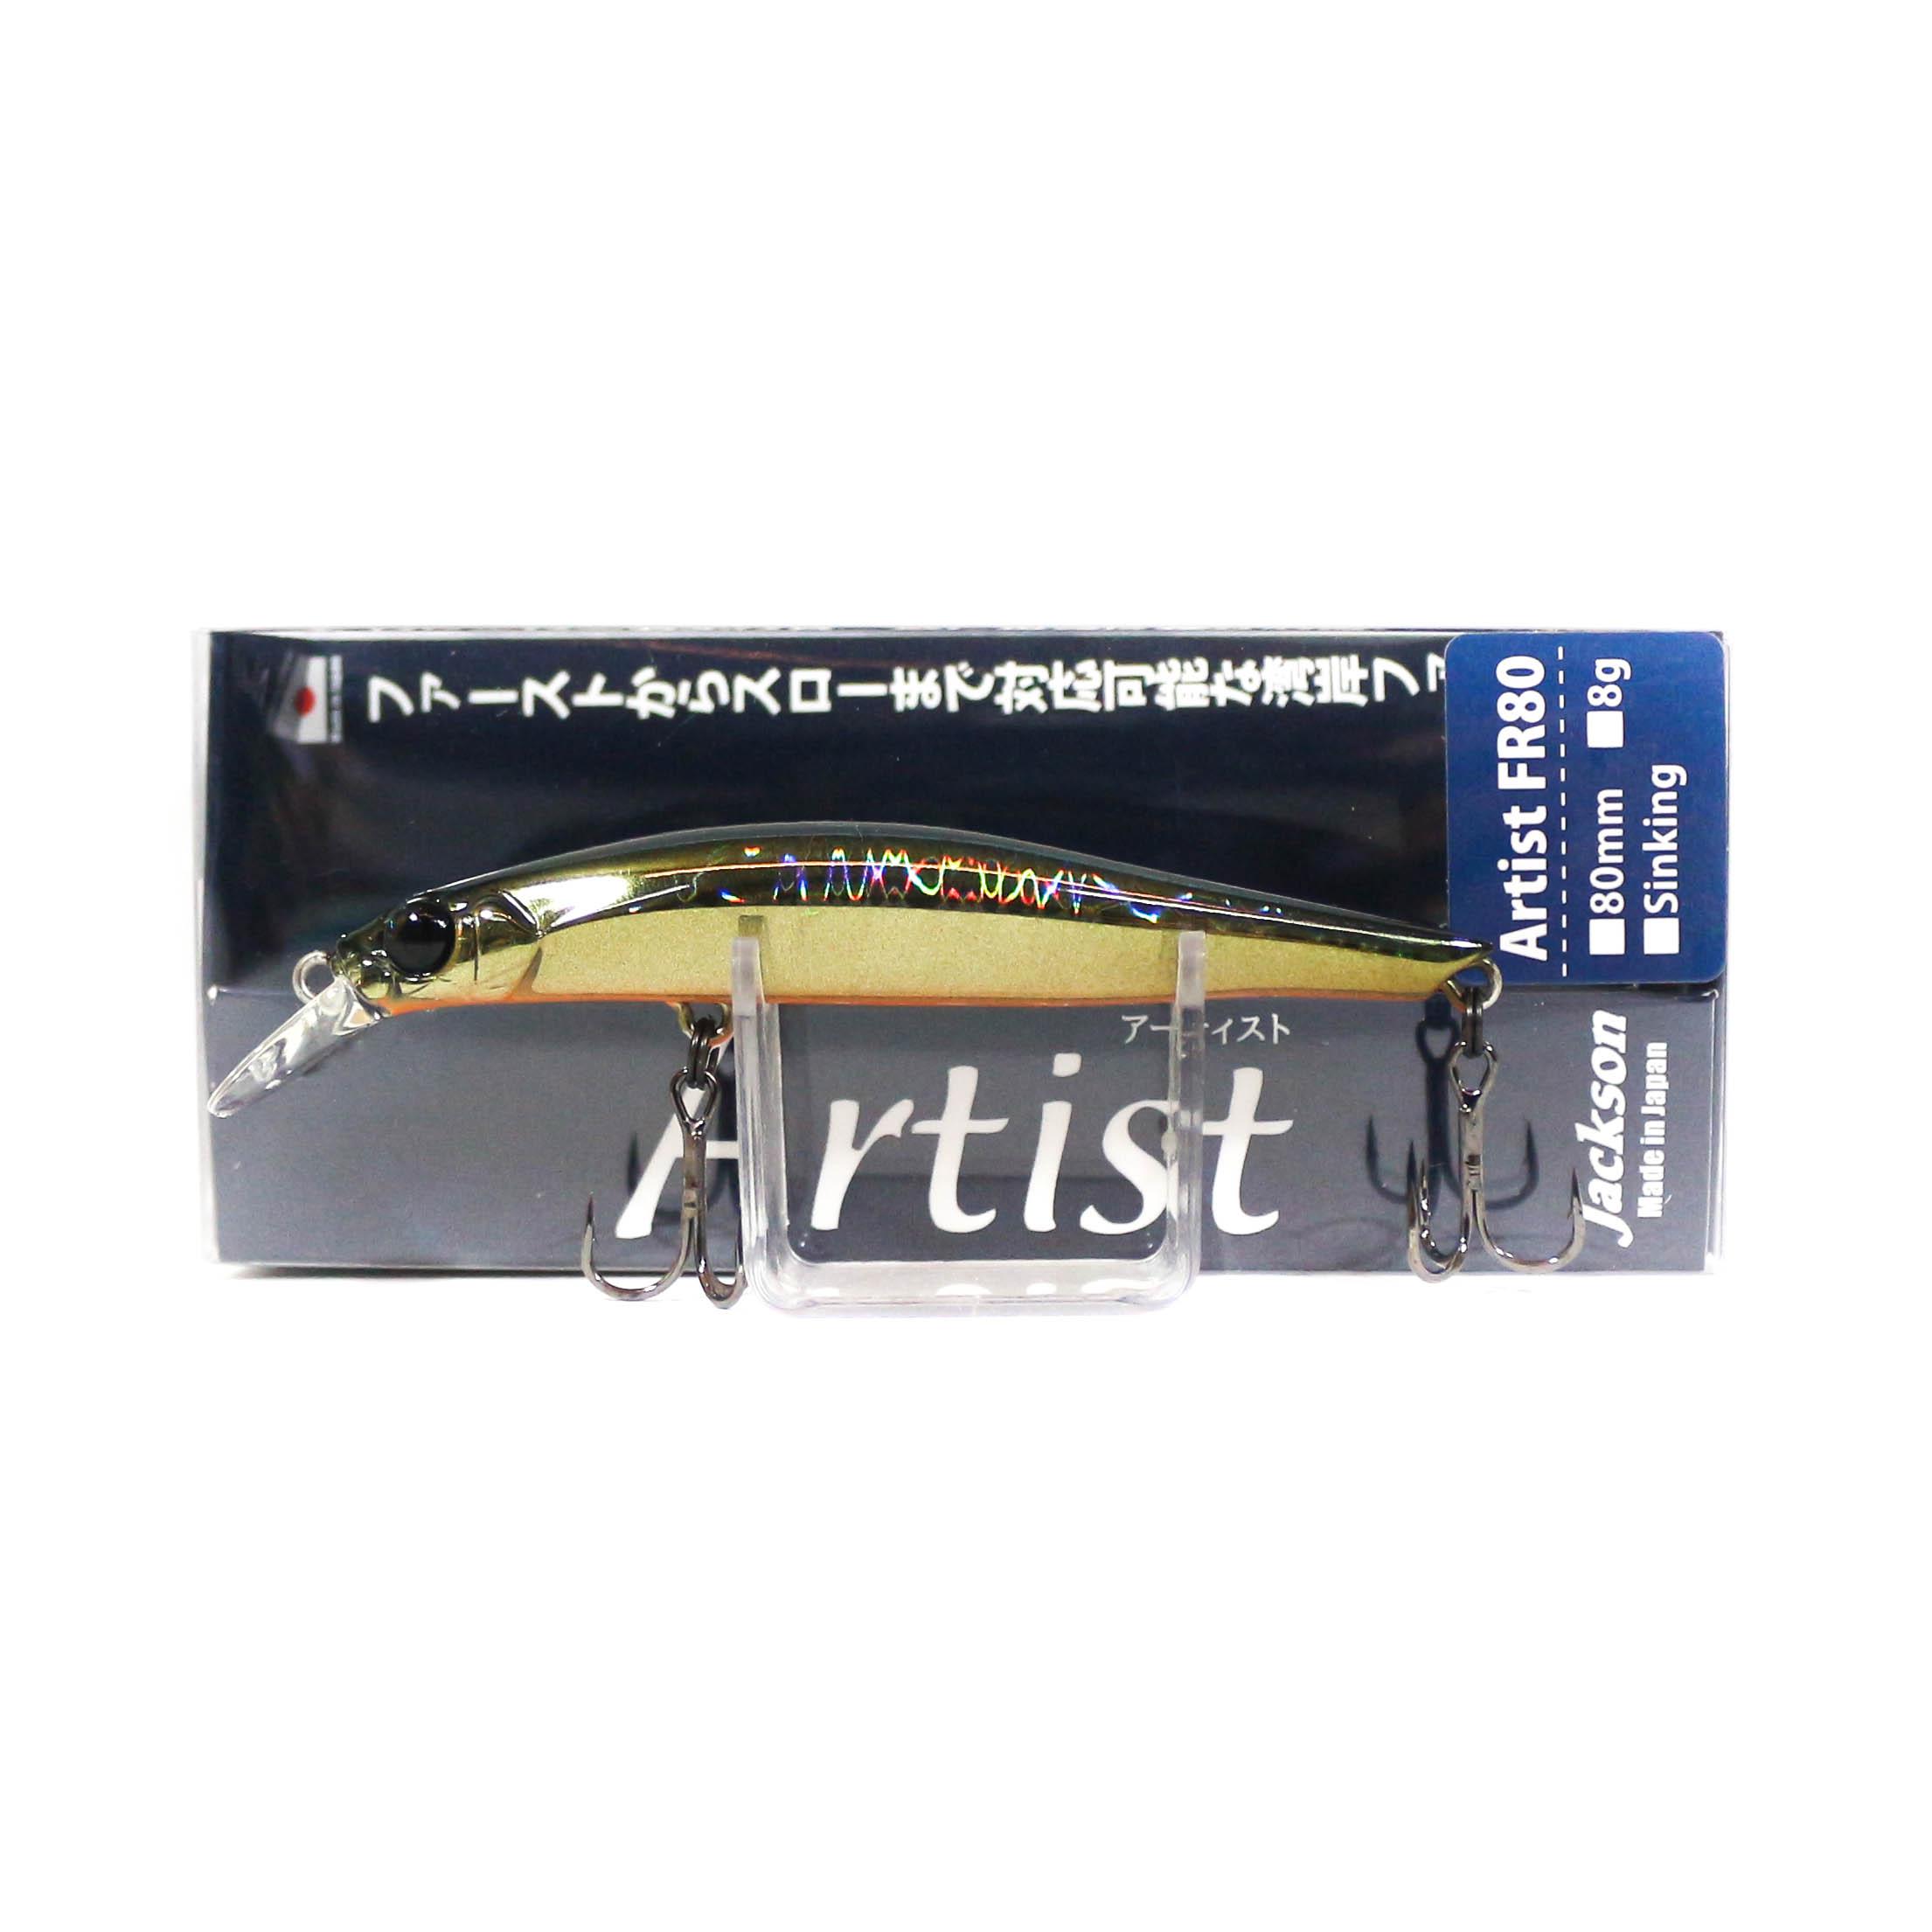 Jackson Artist FR 80 Sinking Minnow Lure GDS (5069)